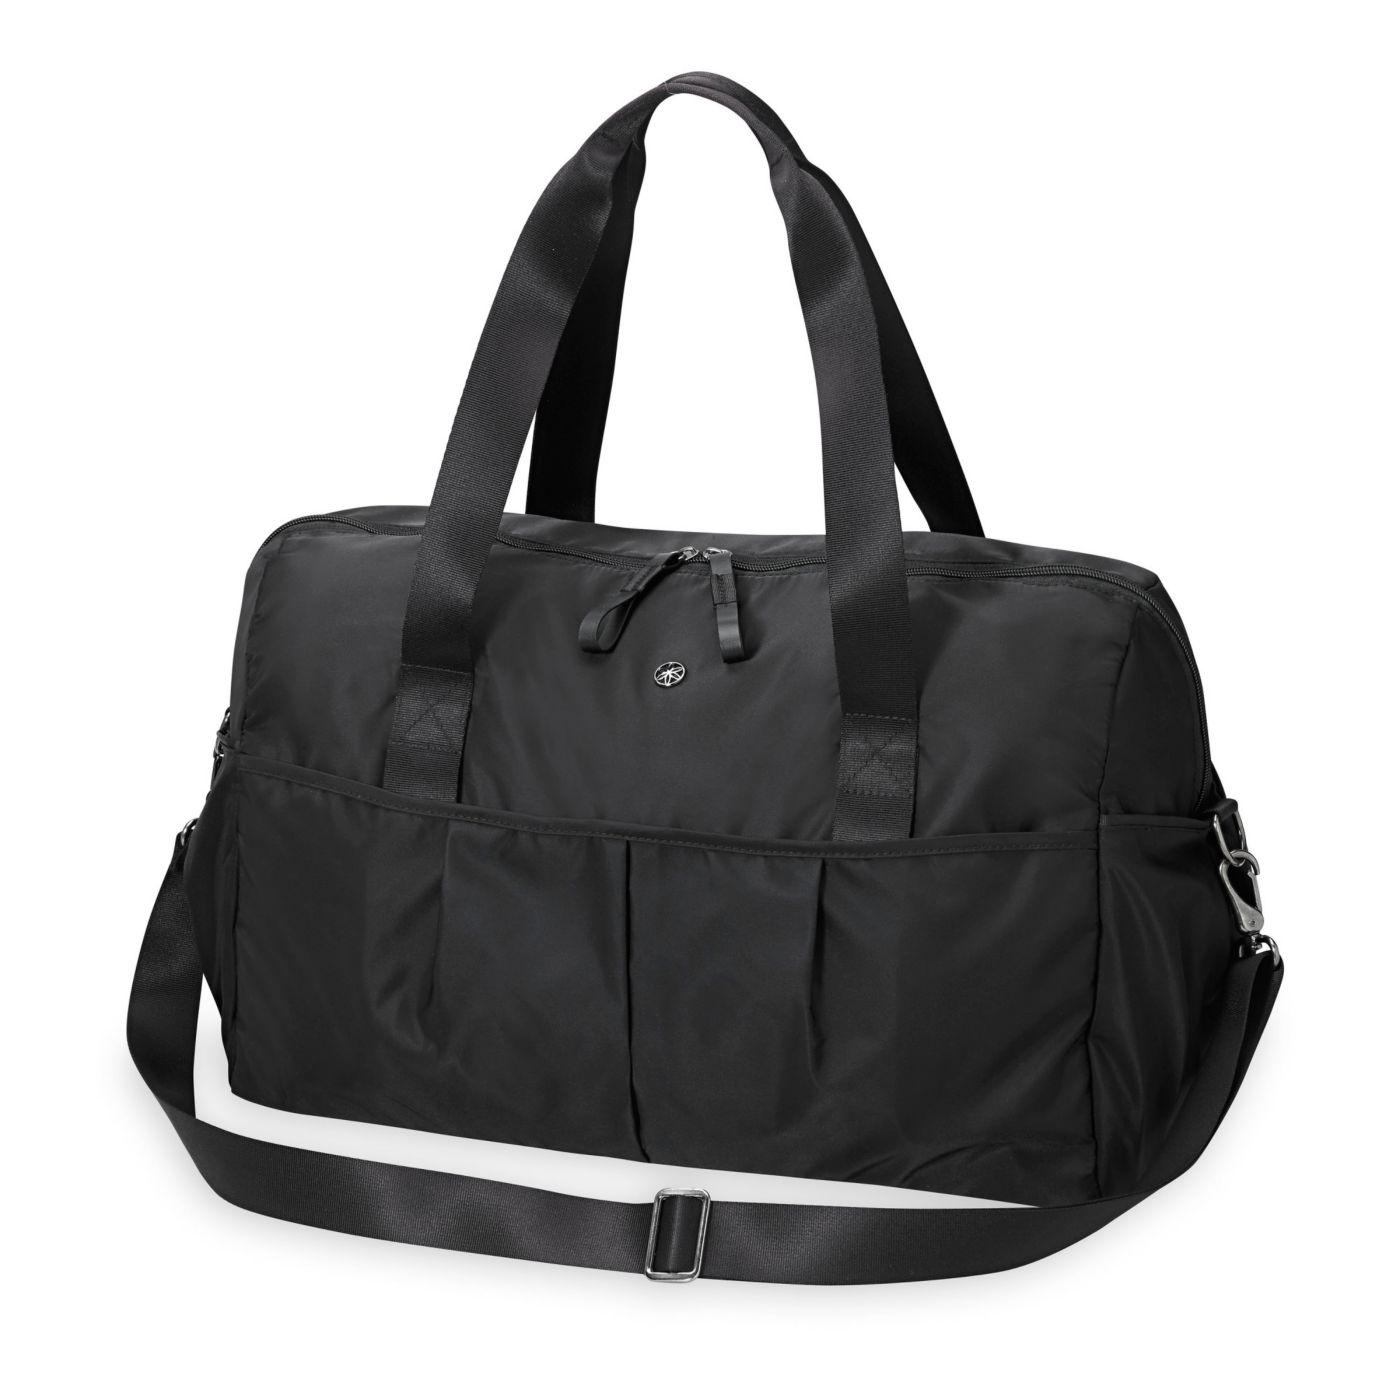 Gaiam Studio to Street Bag